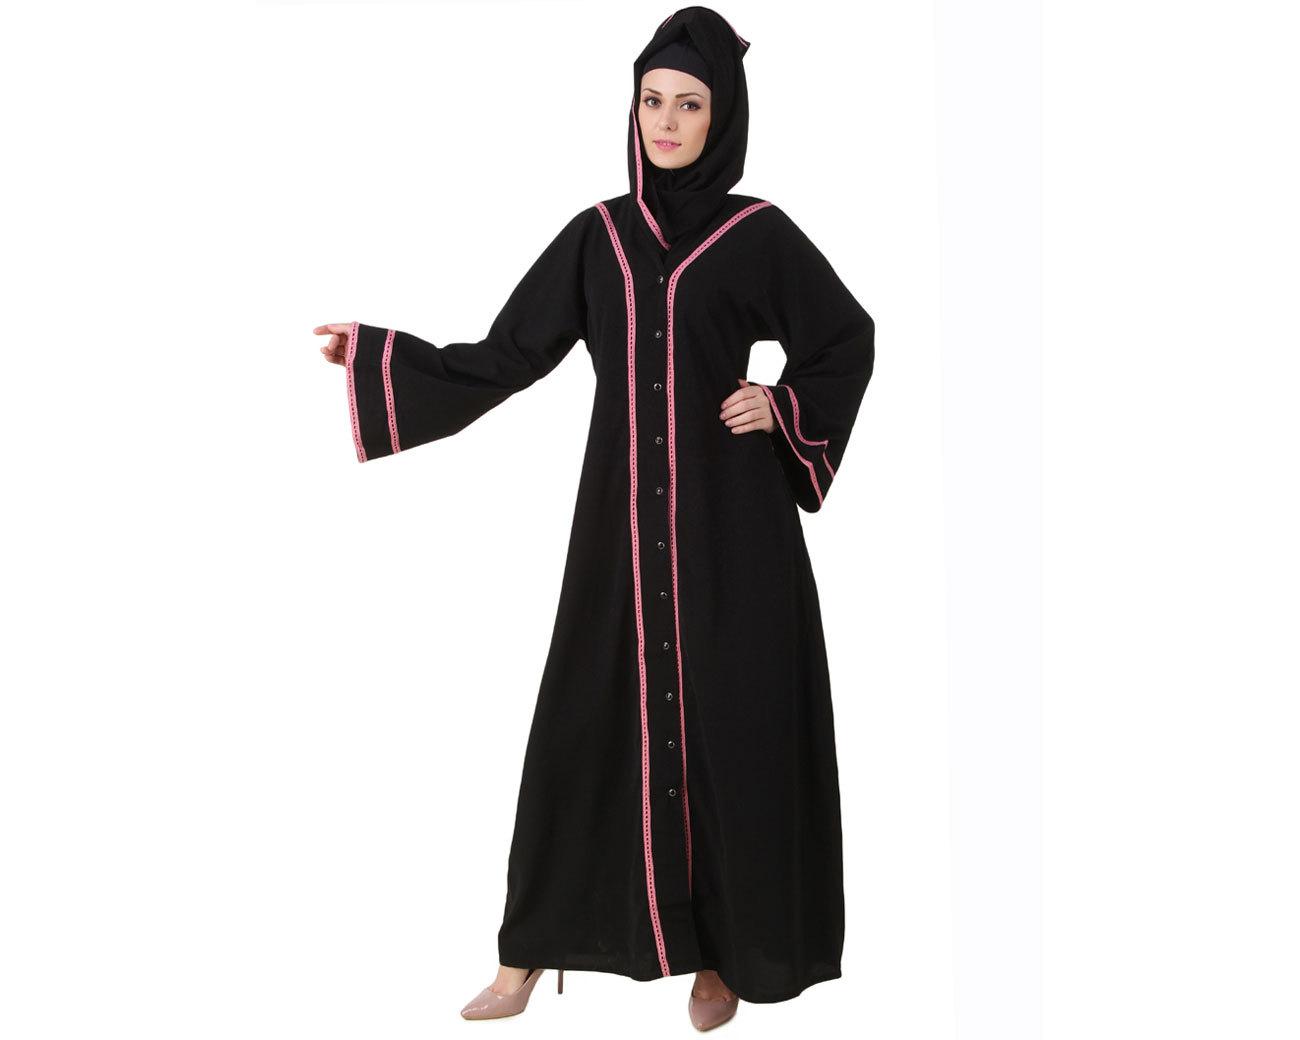 Traditional Costume clipart abaya Black Muslim dress Abaya Maxi